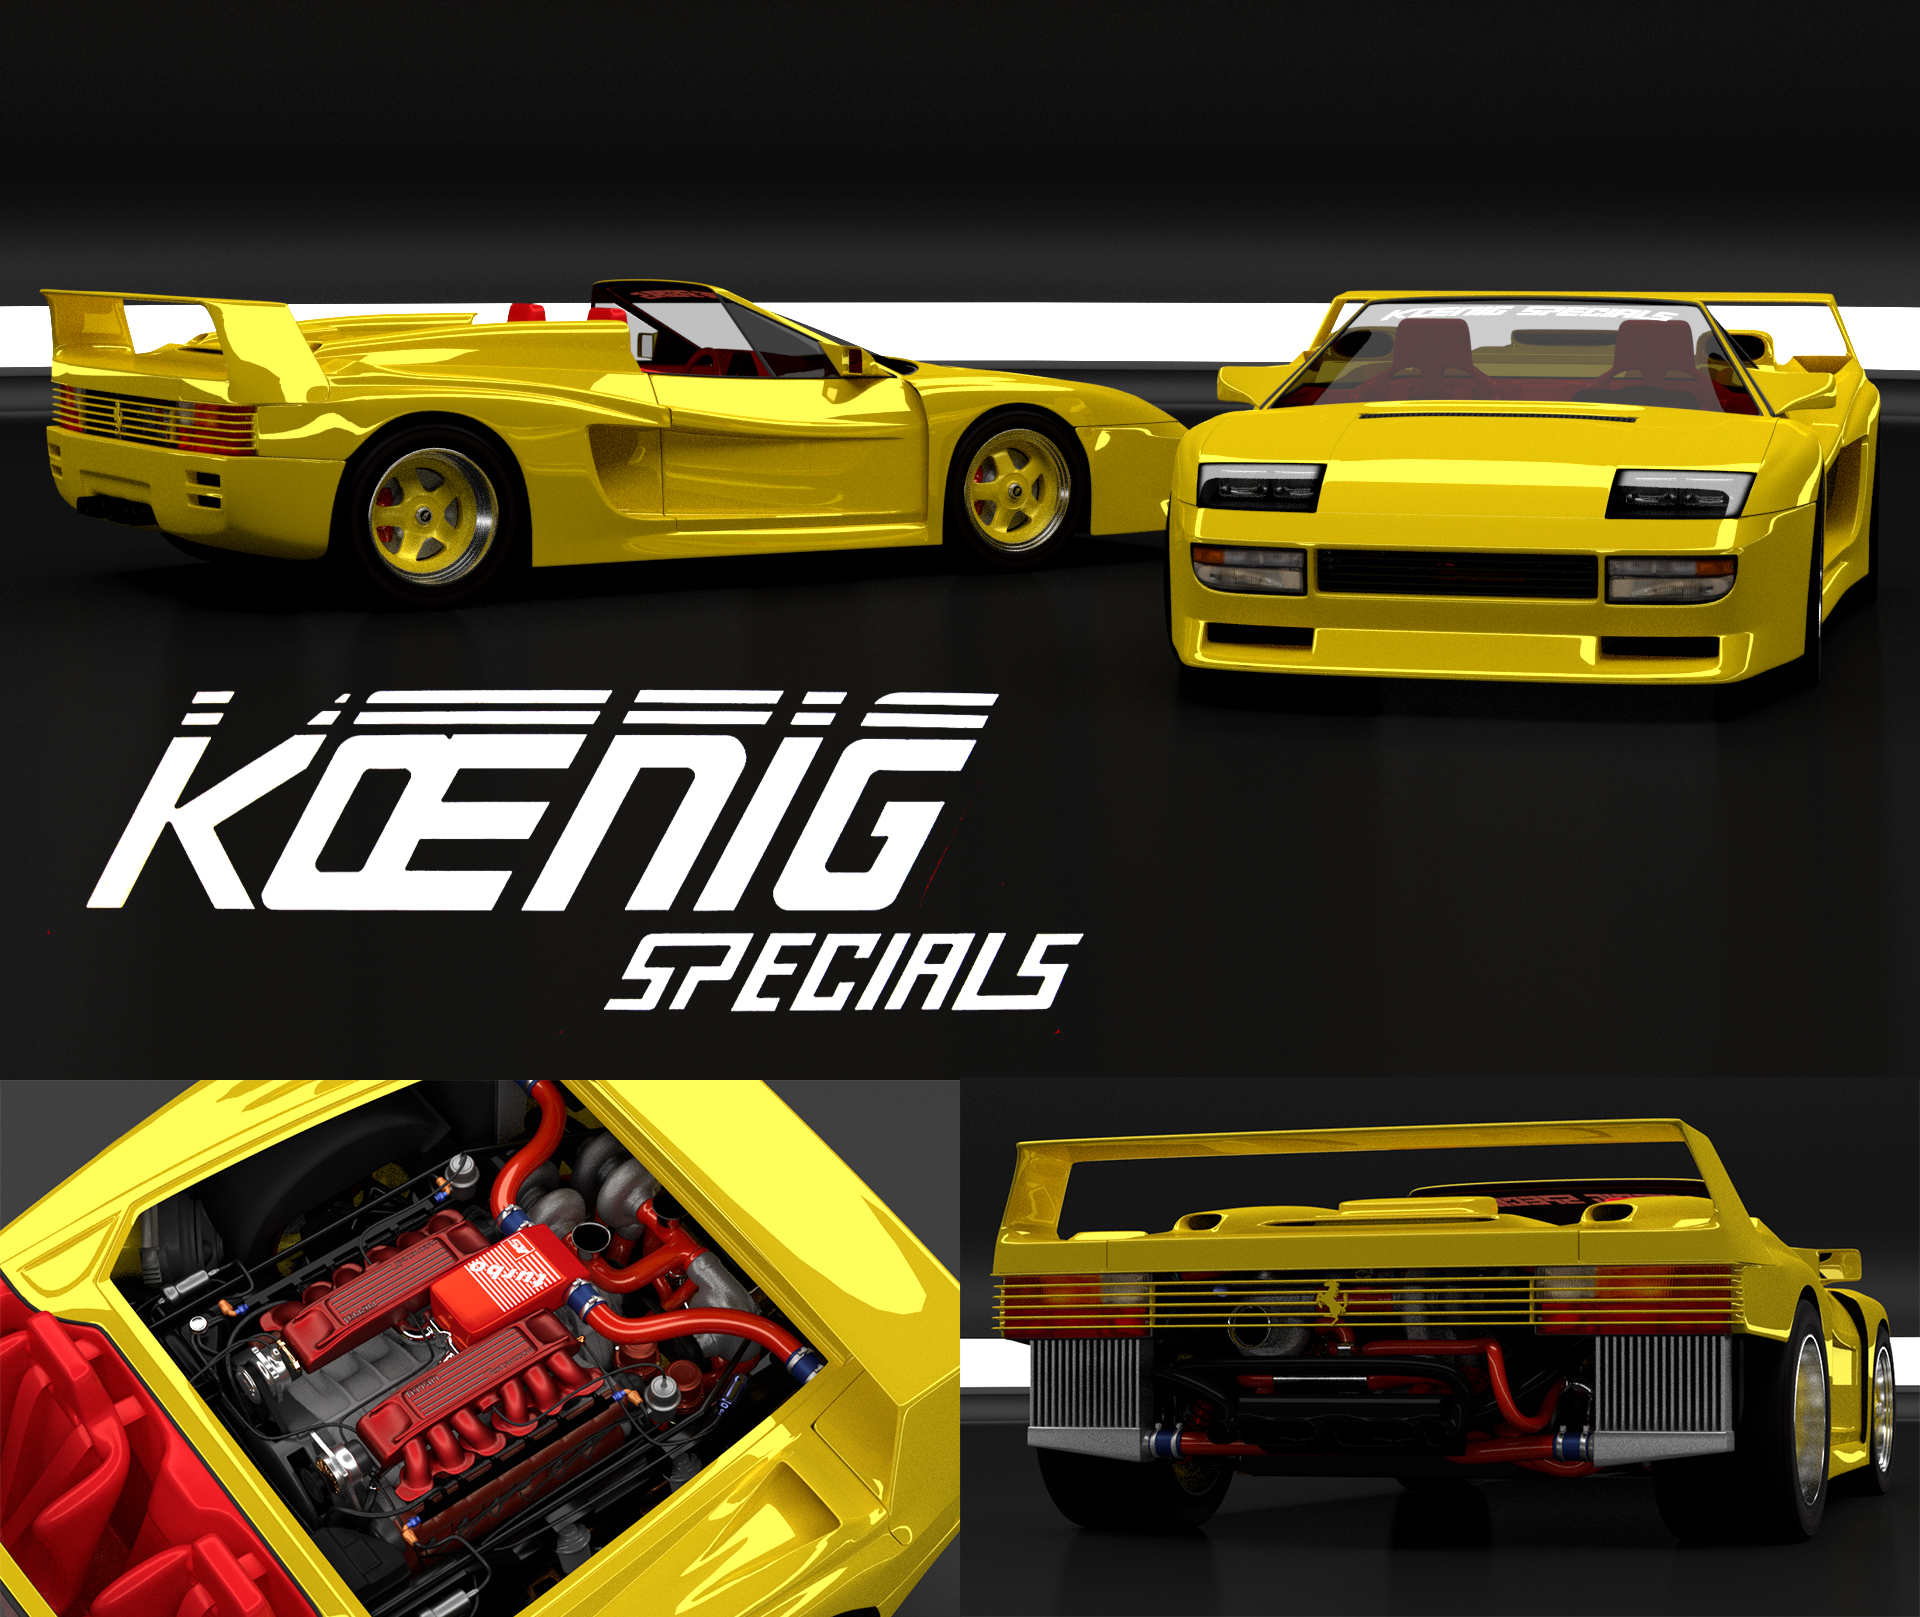 Ferrari Testarossa Koenig Free 3d Model By Jbfree3d On Deviantart